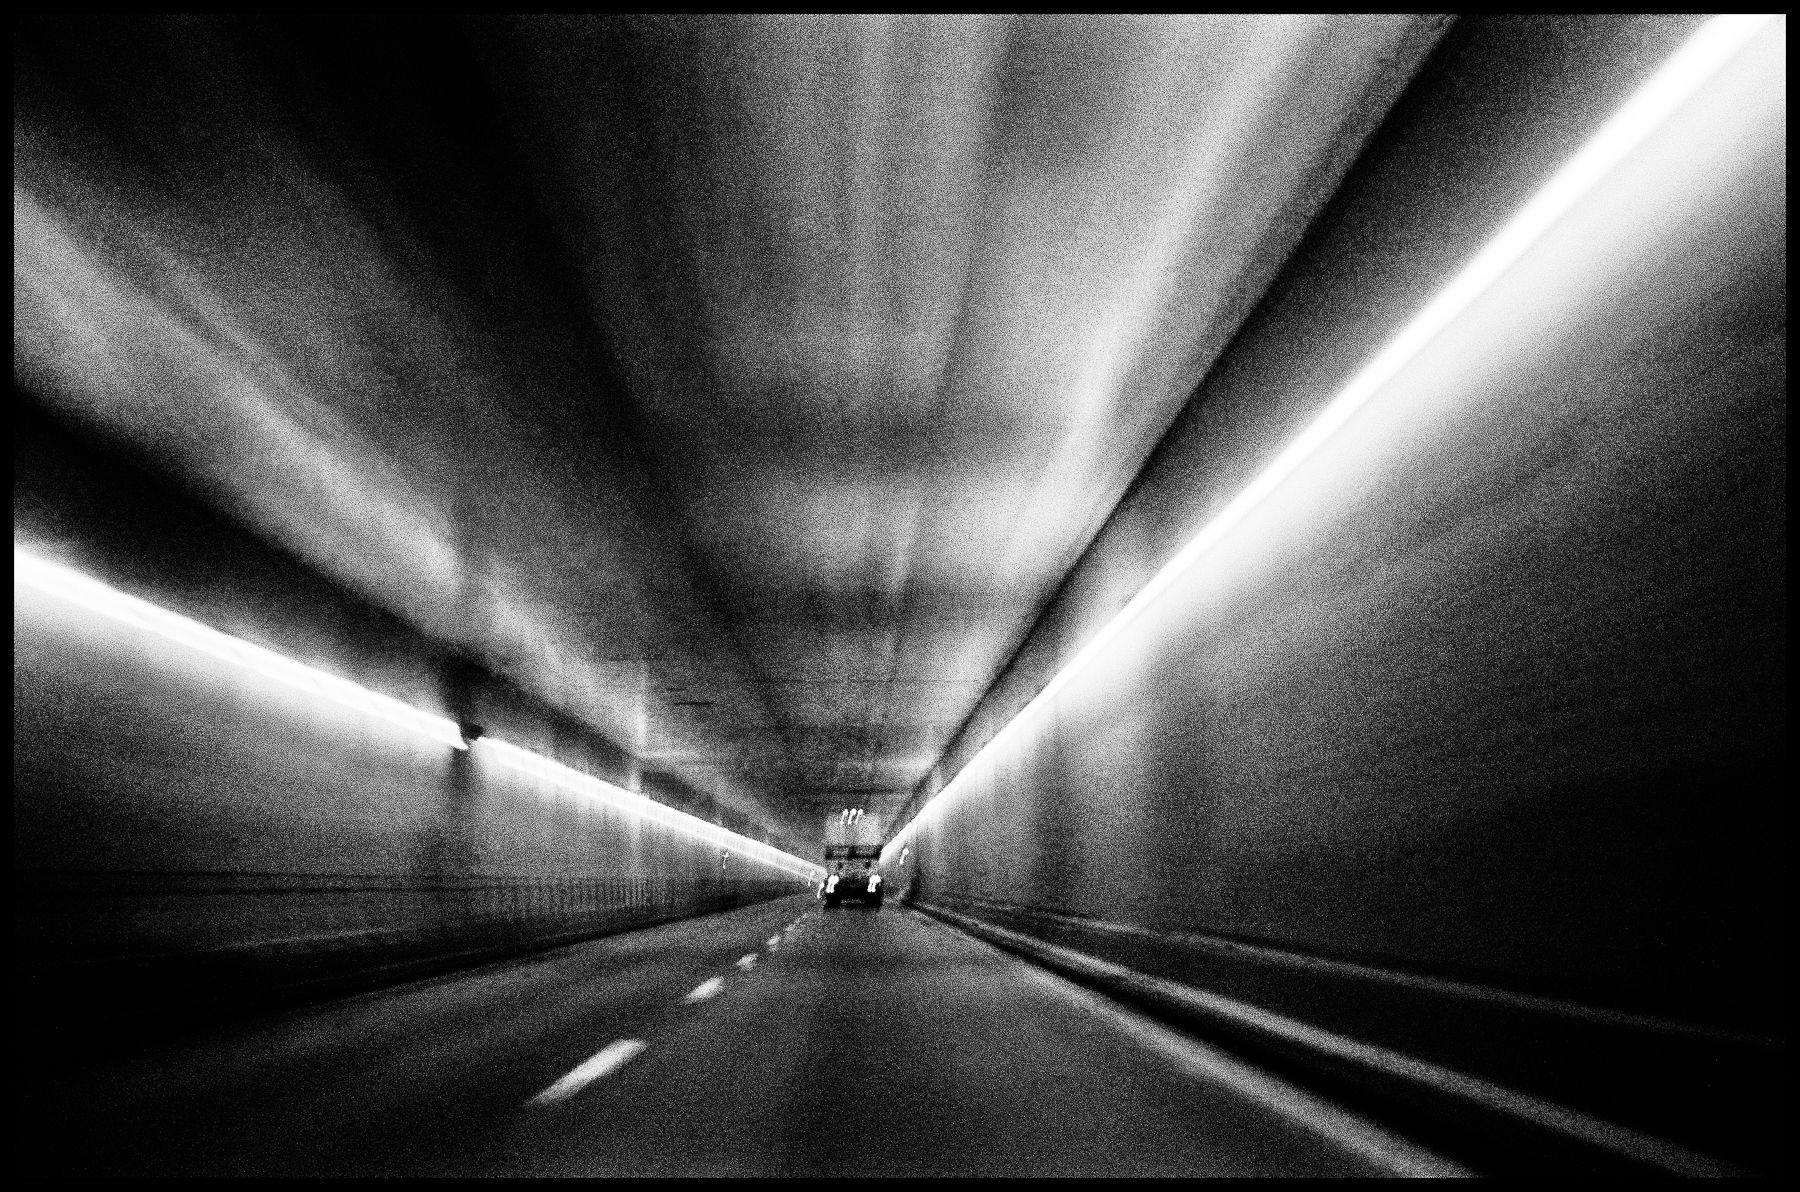 Interstate Hwy. 64, VA, 1986